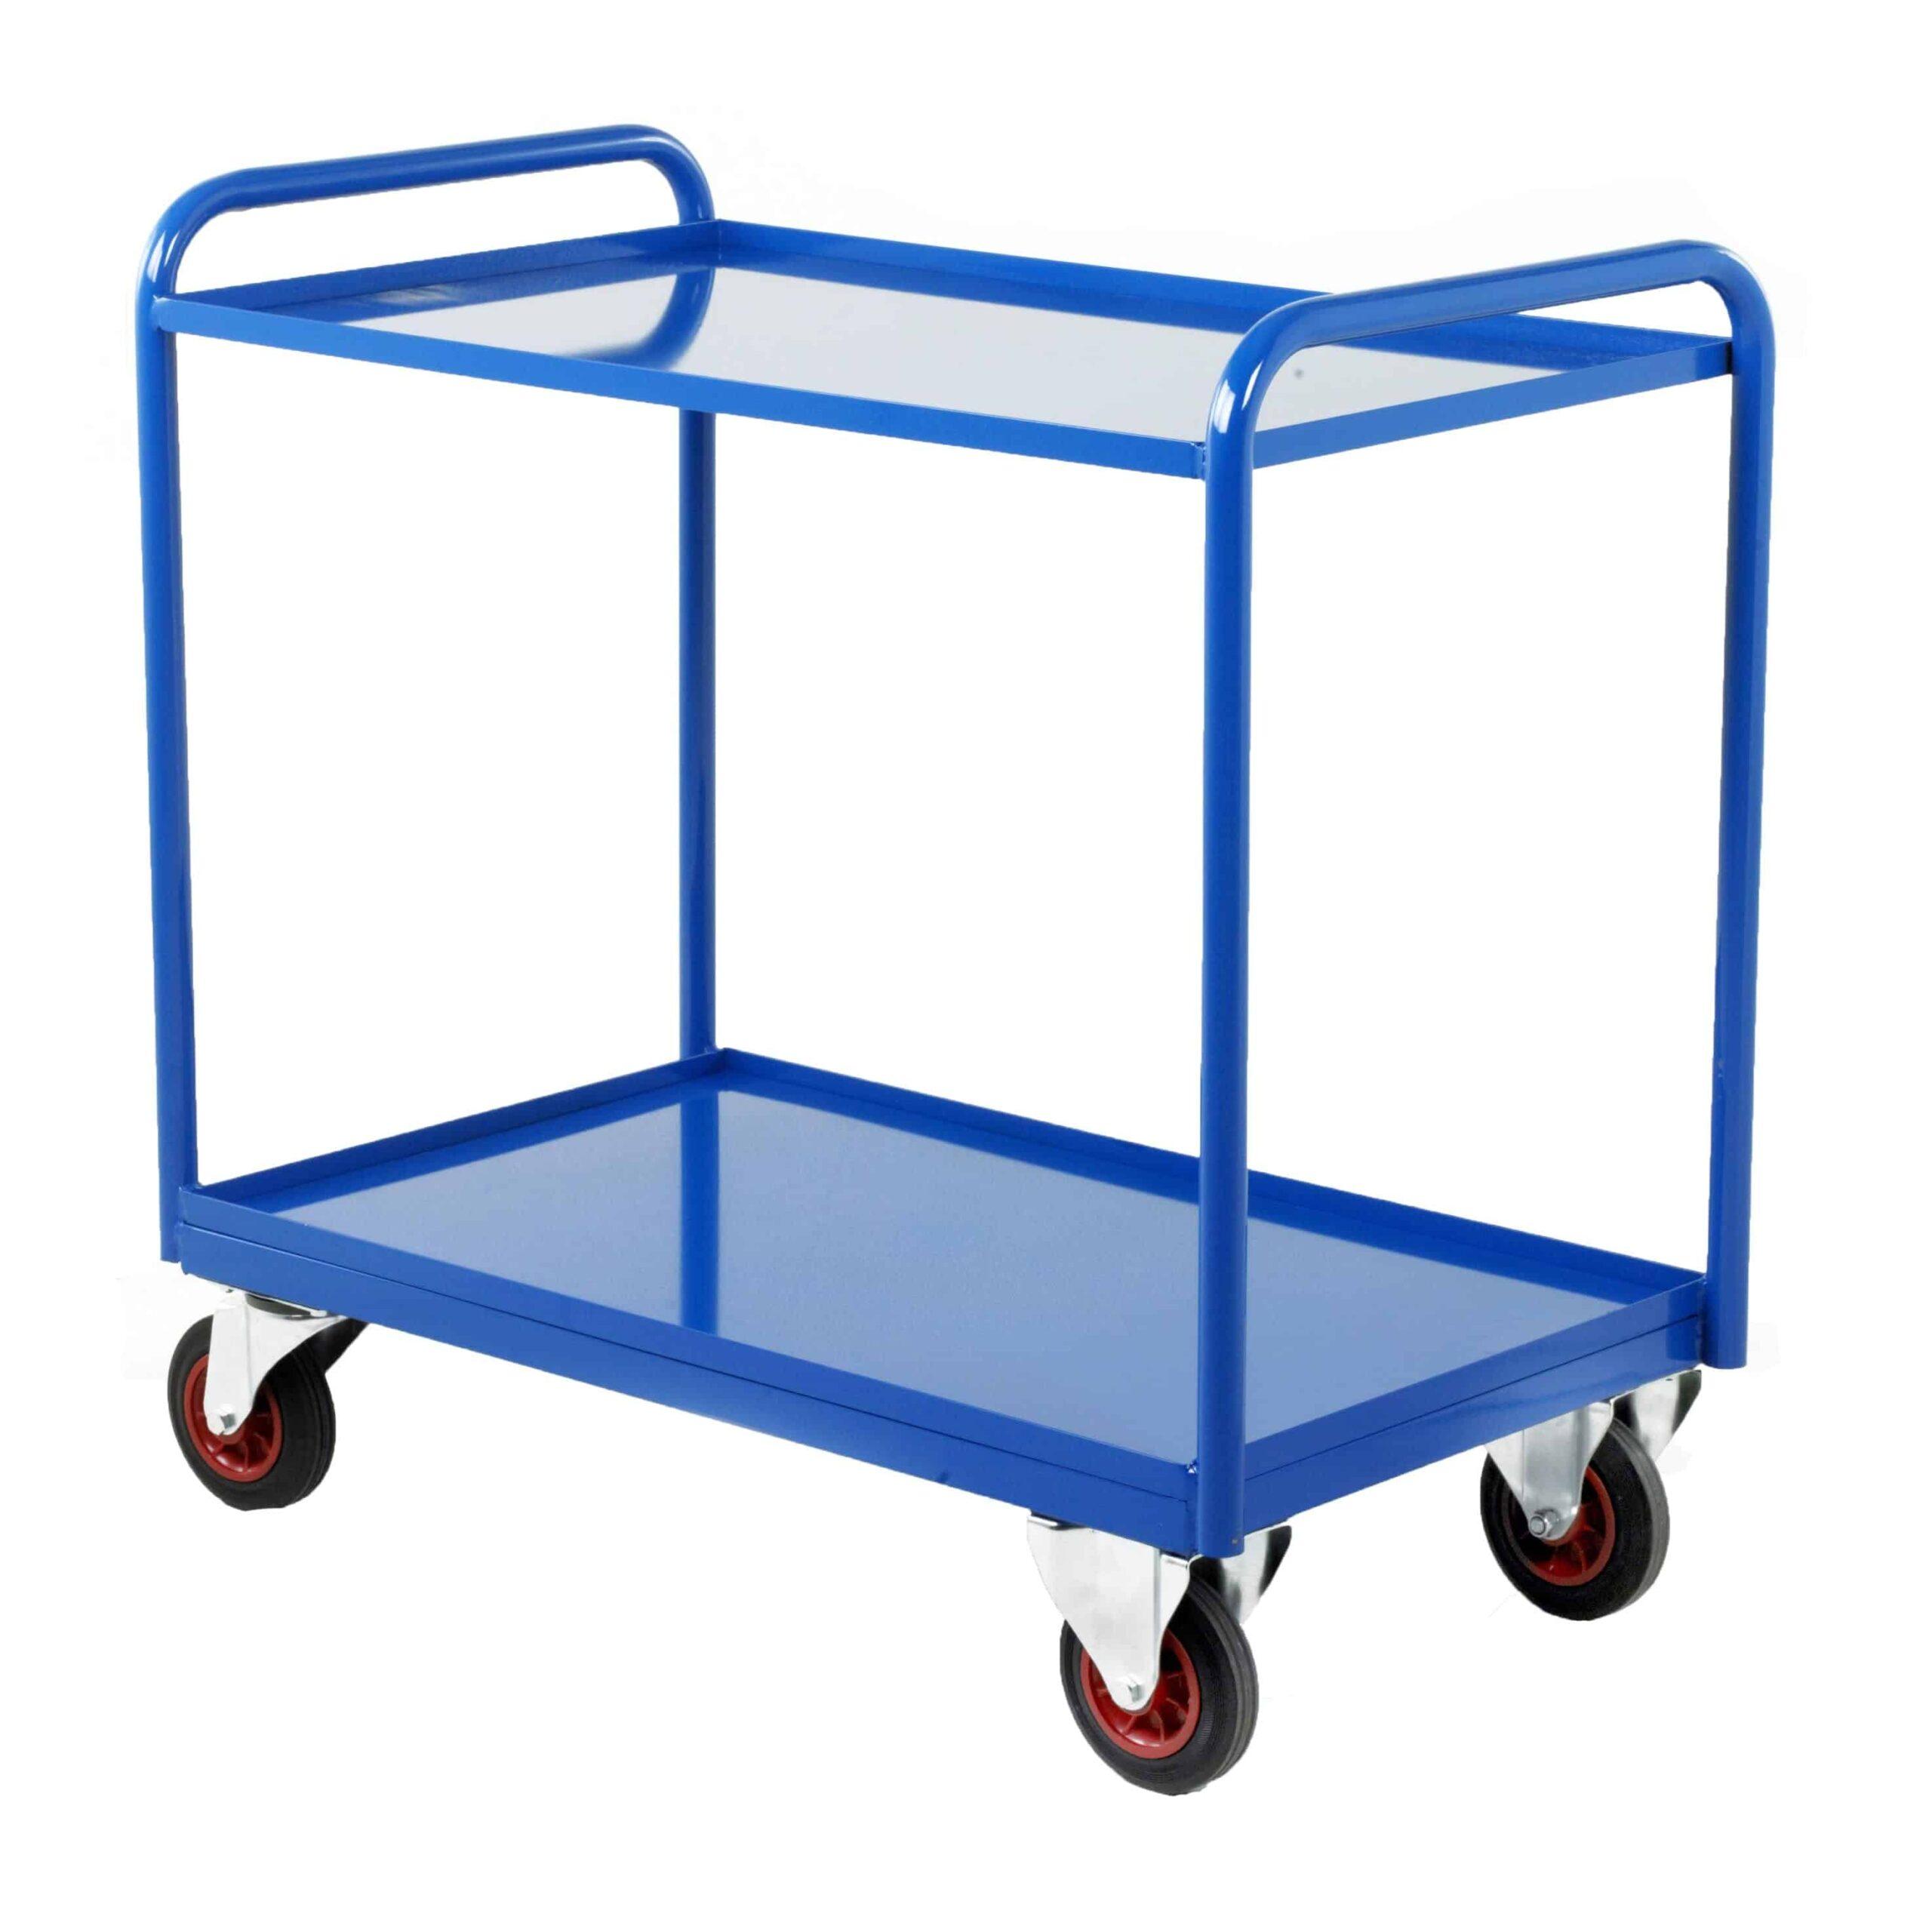 Steel Tray Industrial Tray Trolleys